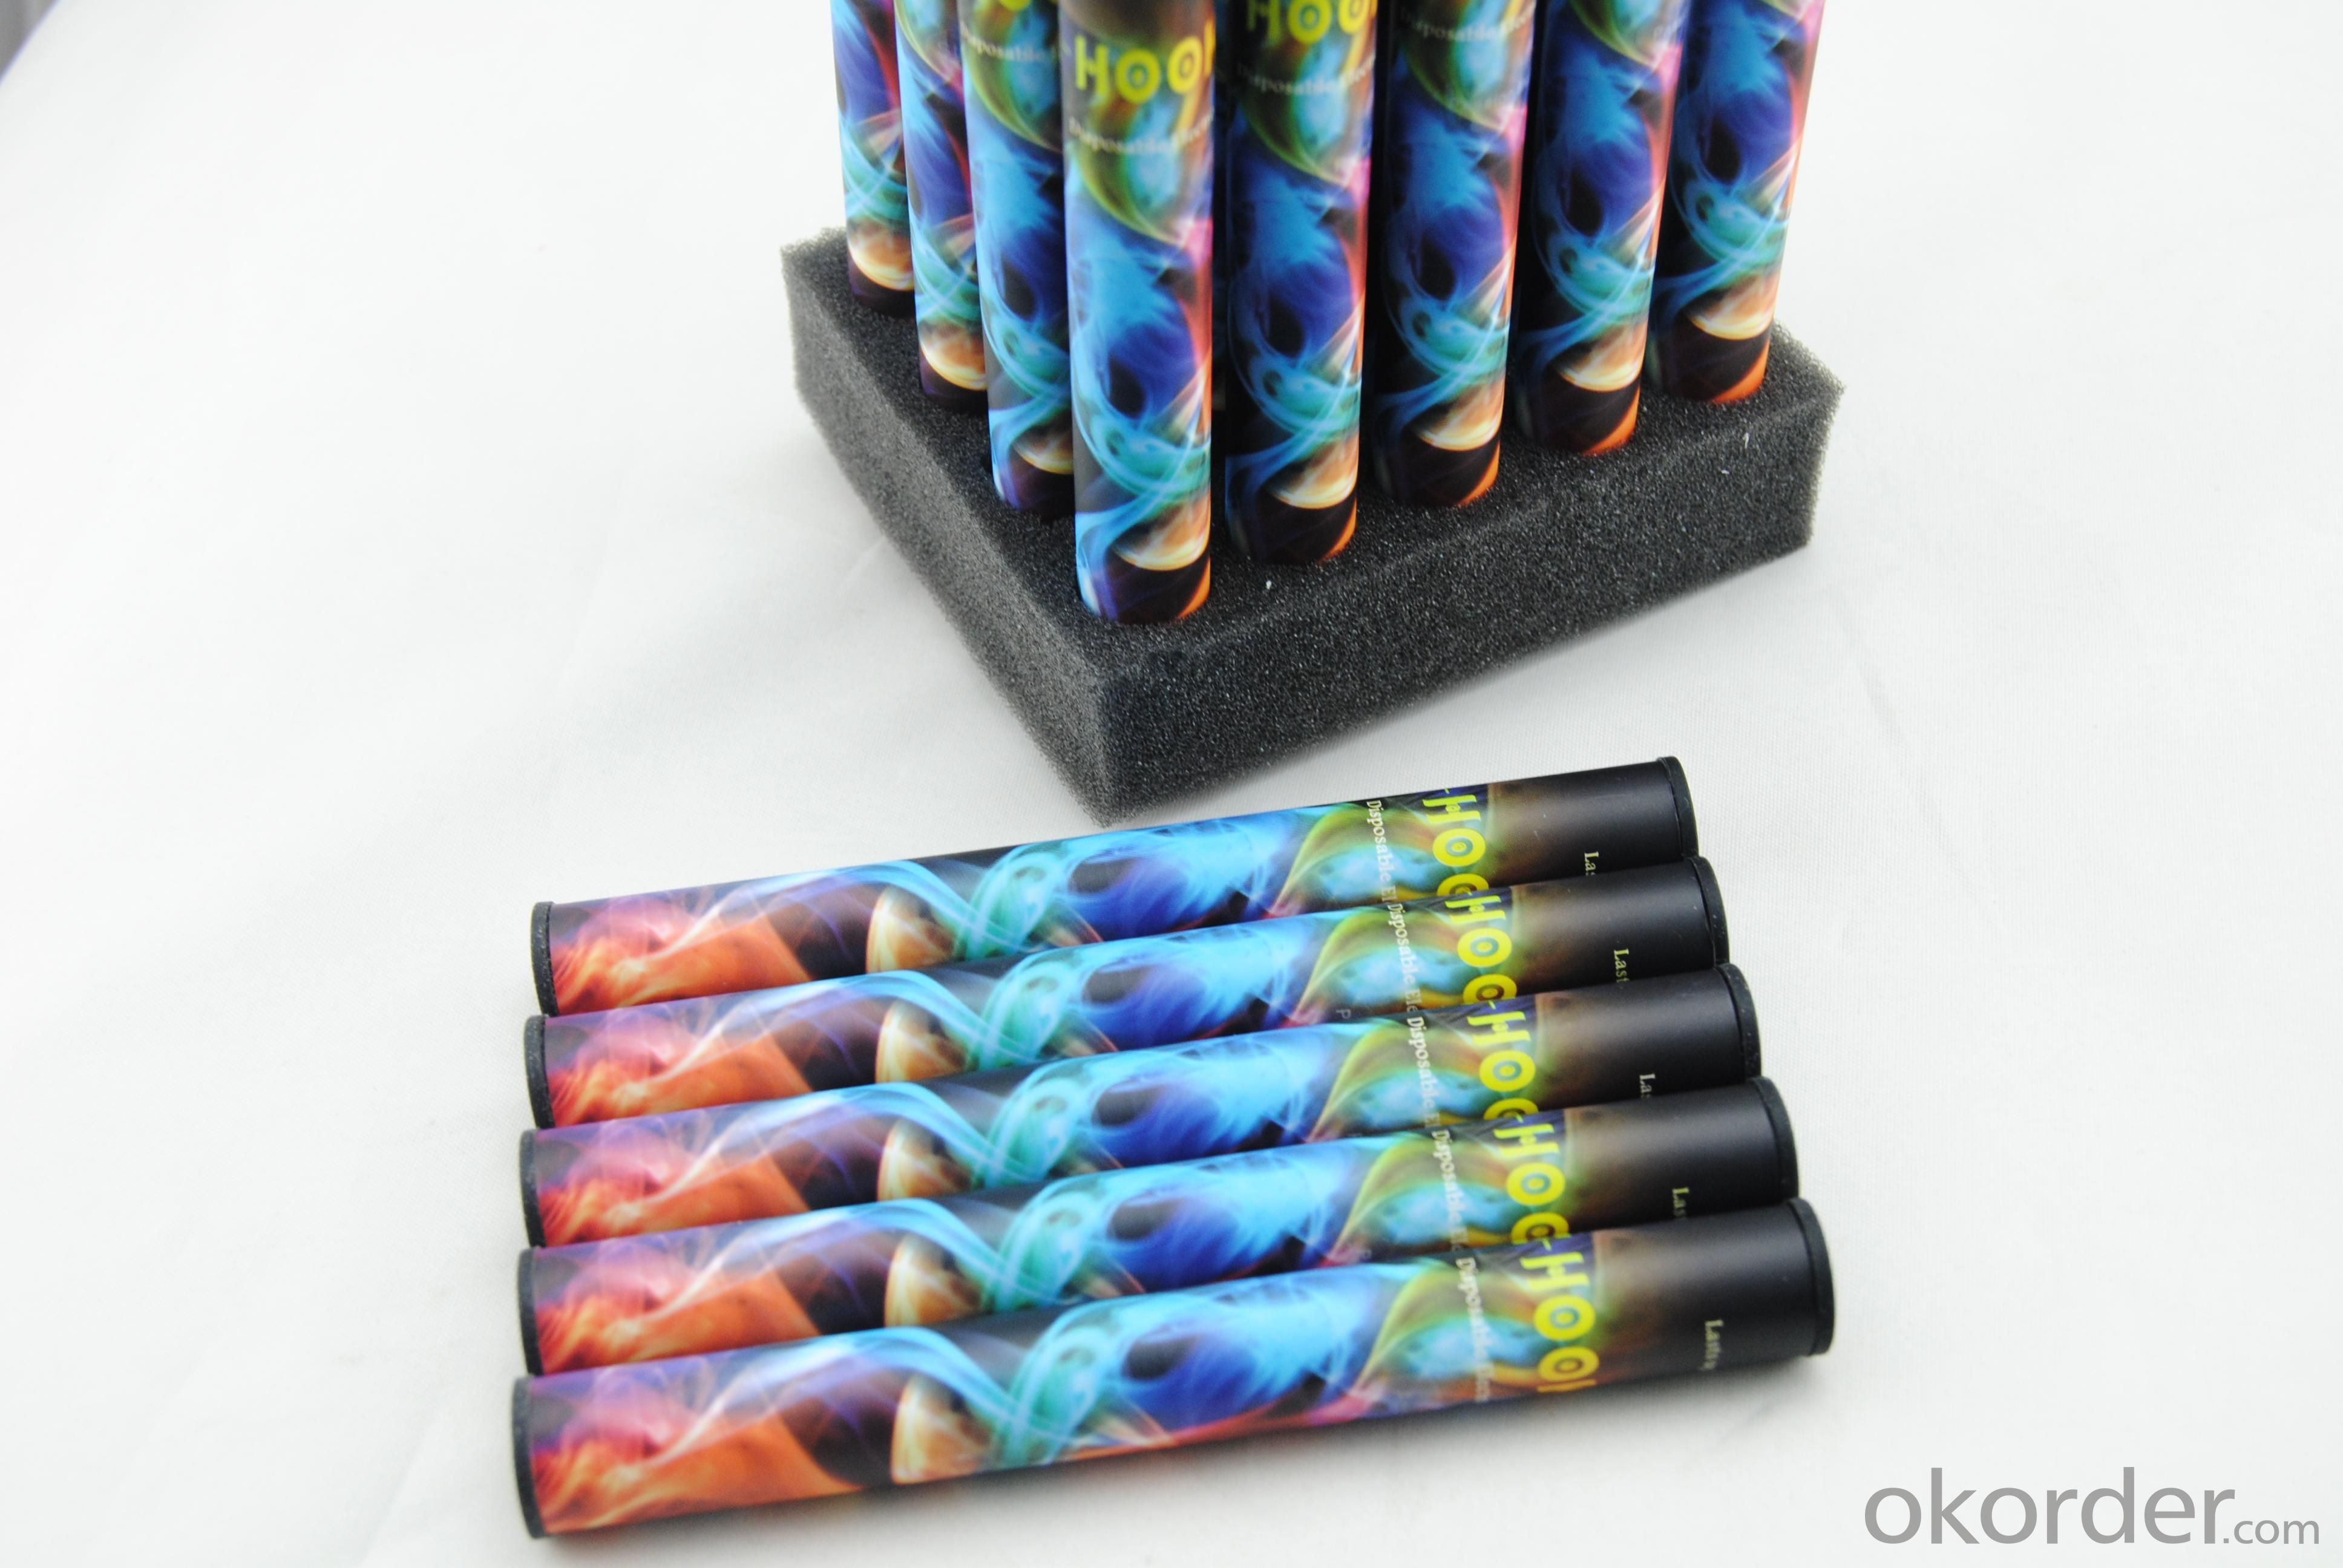 Nwest Popular Electronic Cigarette Vaporizer Hookah Shisha